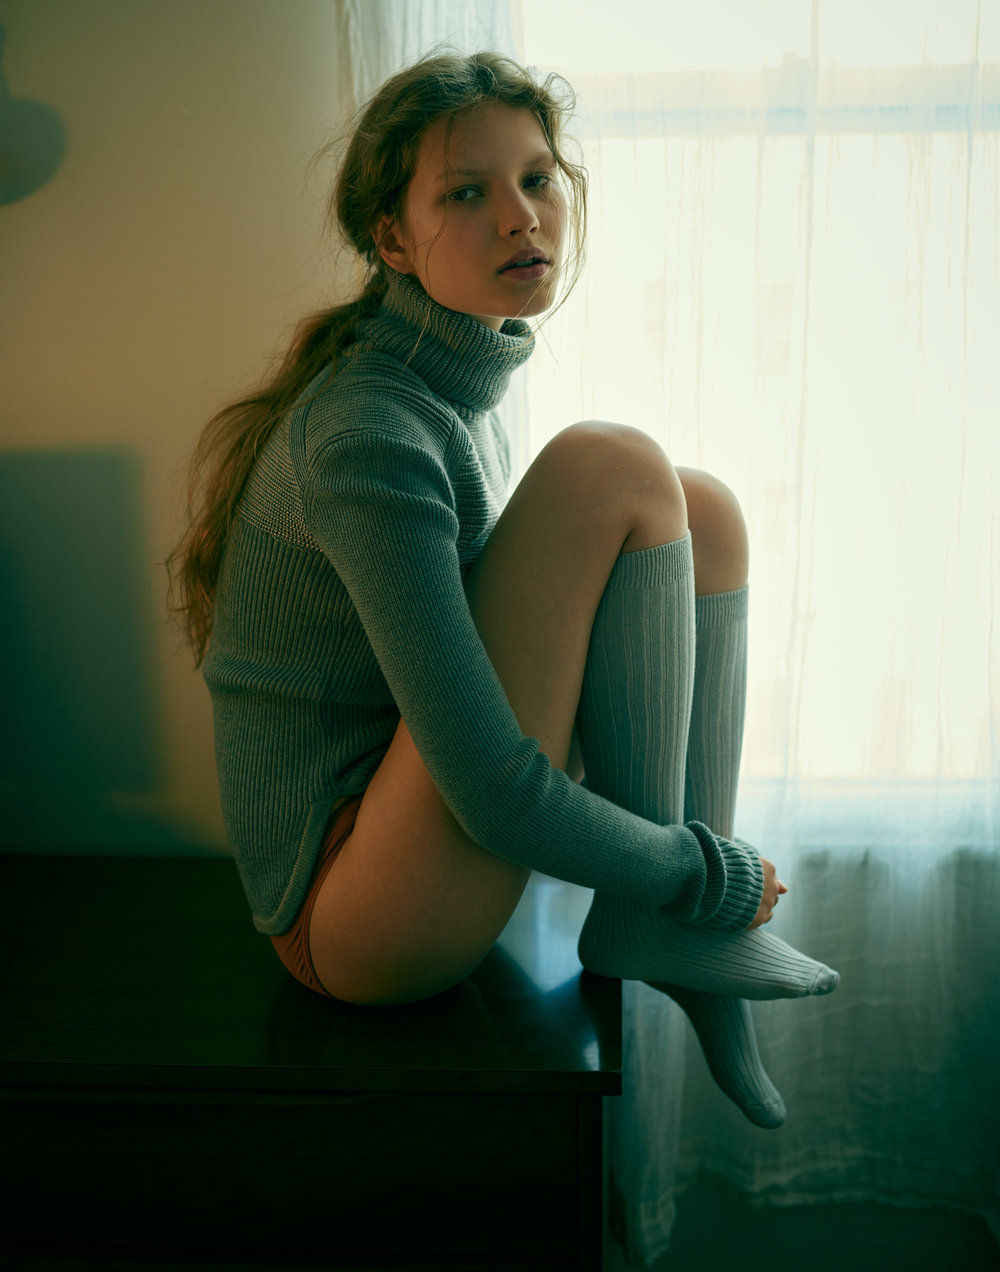 Anabel by Stas Komarovski